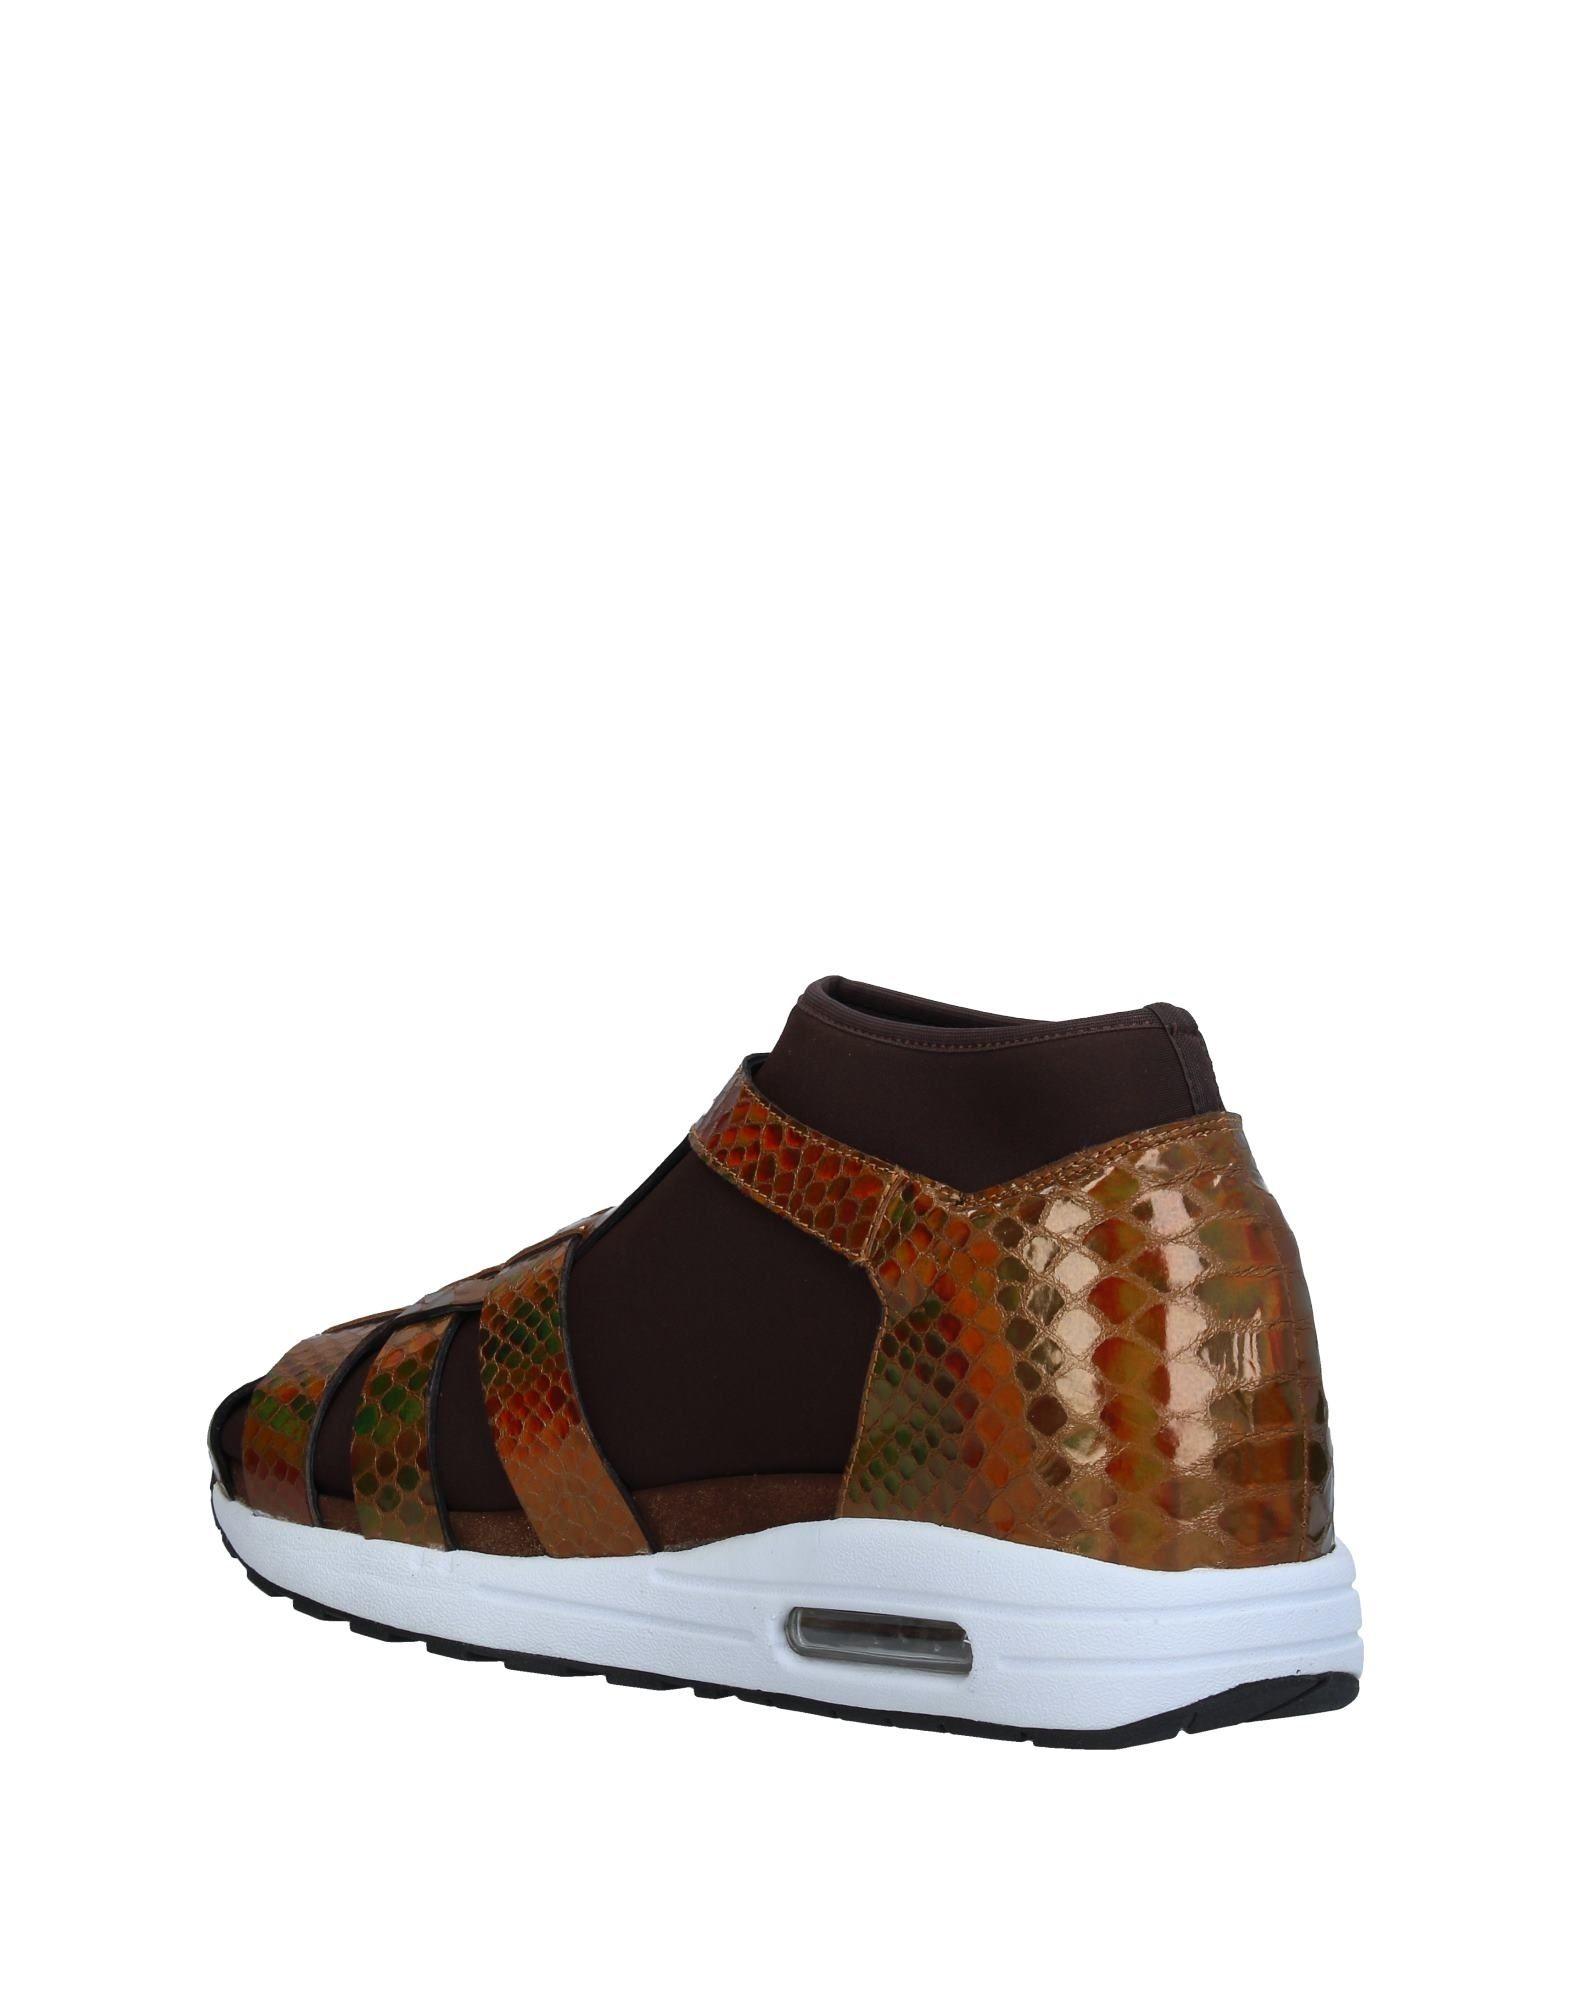 Susana Traca Sneakers Damen  11364168RS 11364168RS  Gute Qualität beliebte Schuhe 001f87